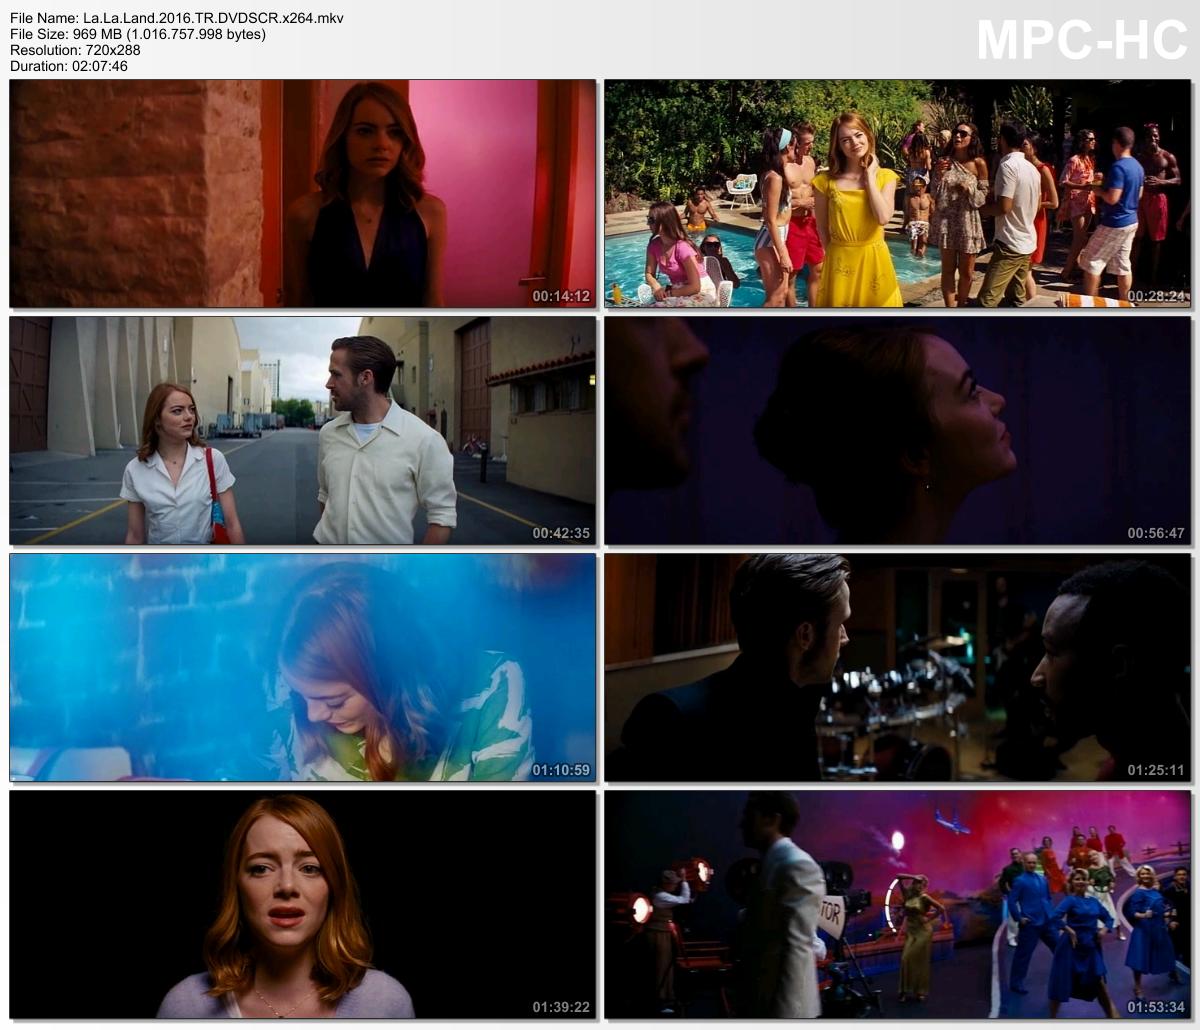 Aşıklar Şehri – La La Land 2016 (Türkçe Dublaj) DVDSCR x264